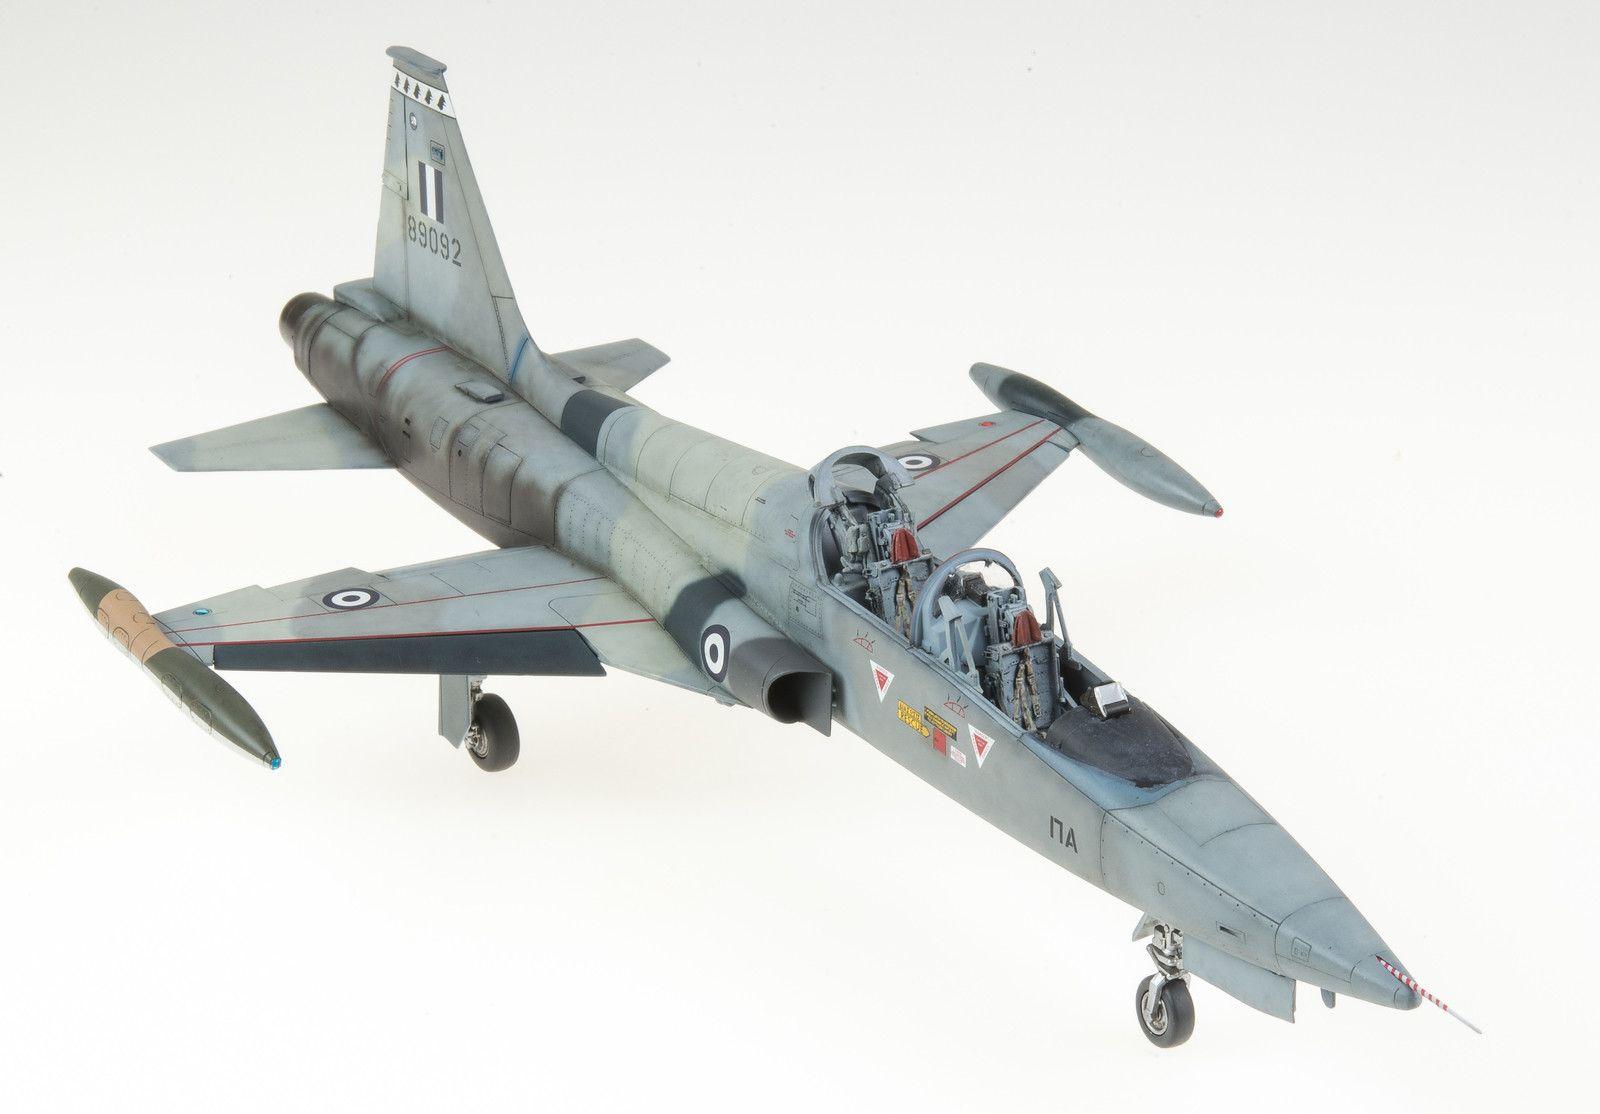 1/48 Kinetic F-5B Freedom Fighter | Modelers Social Club